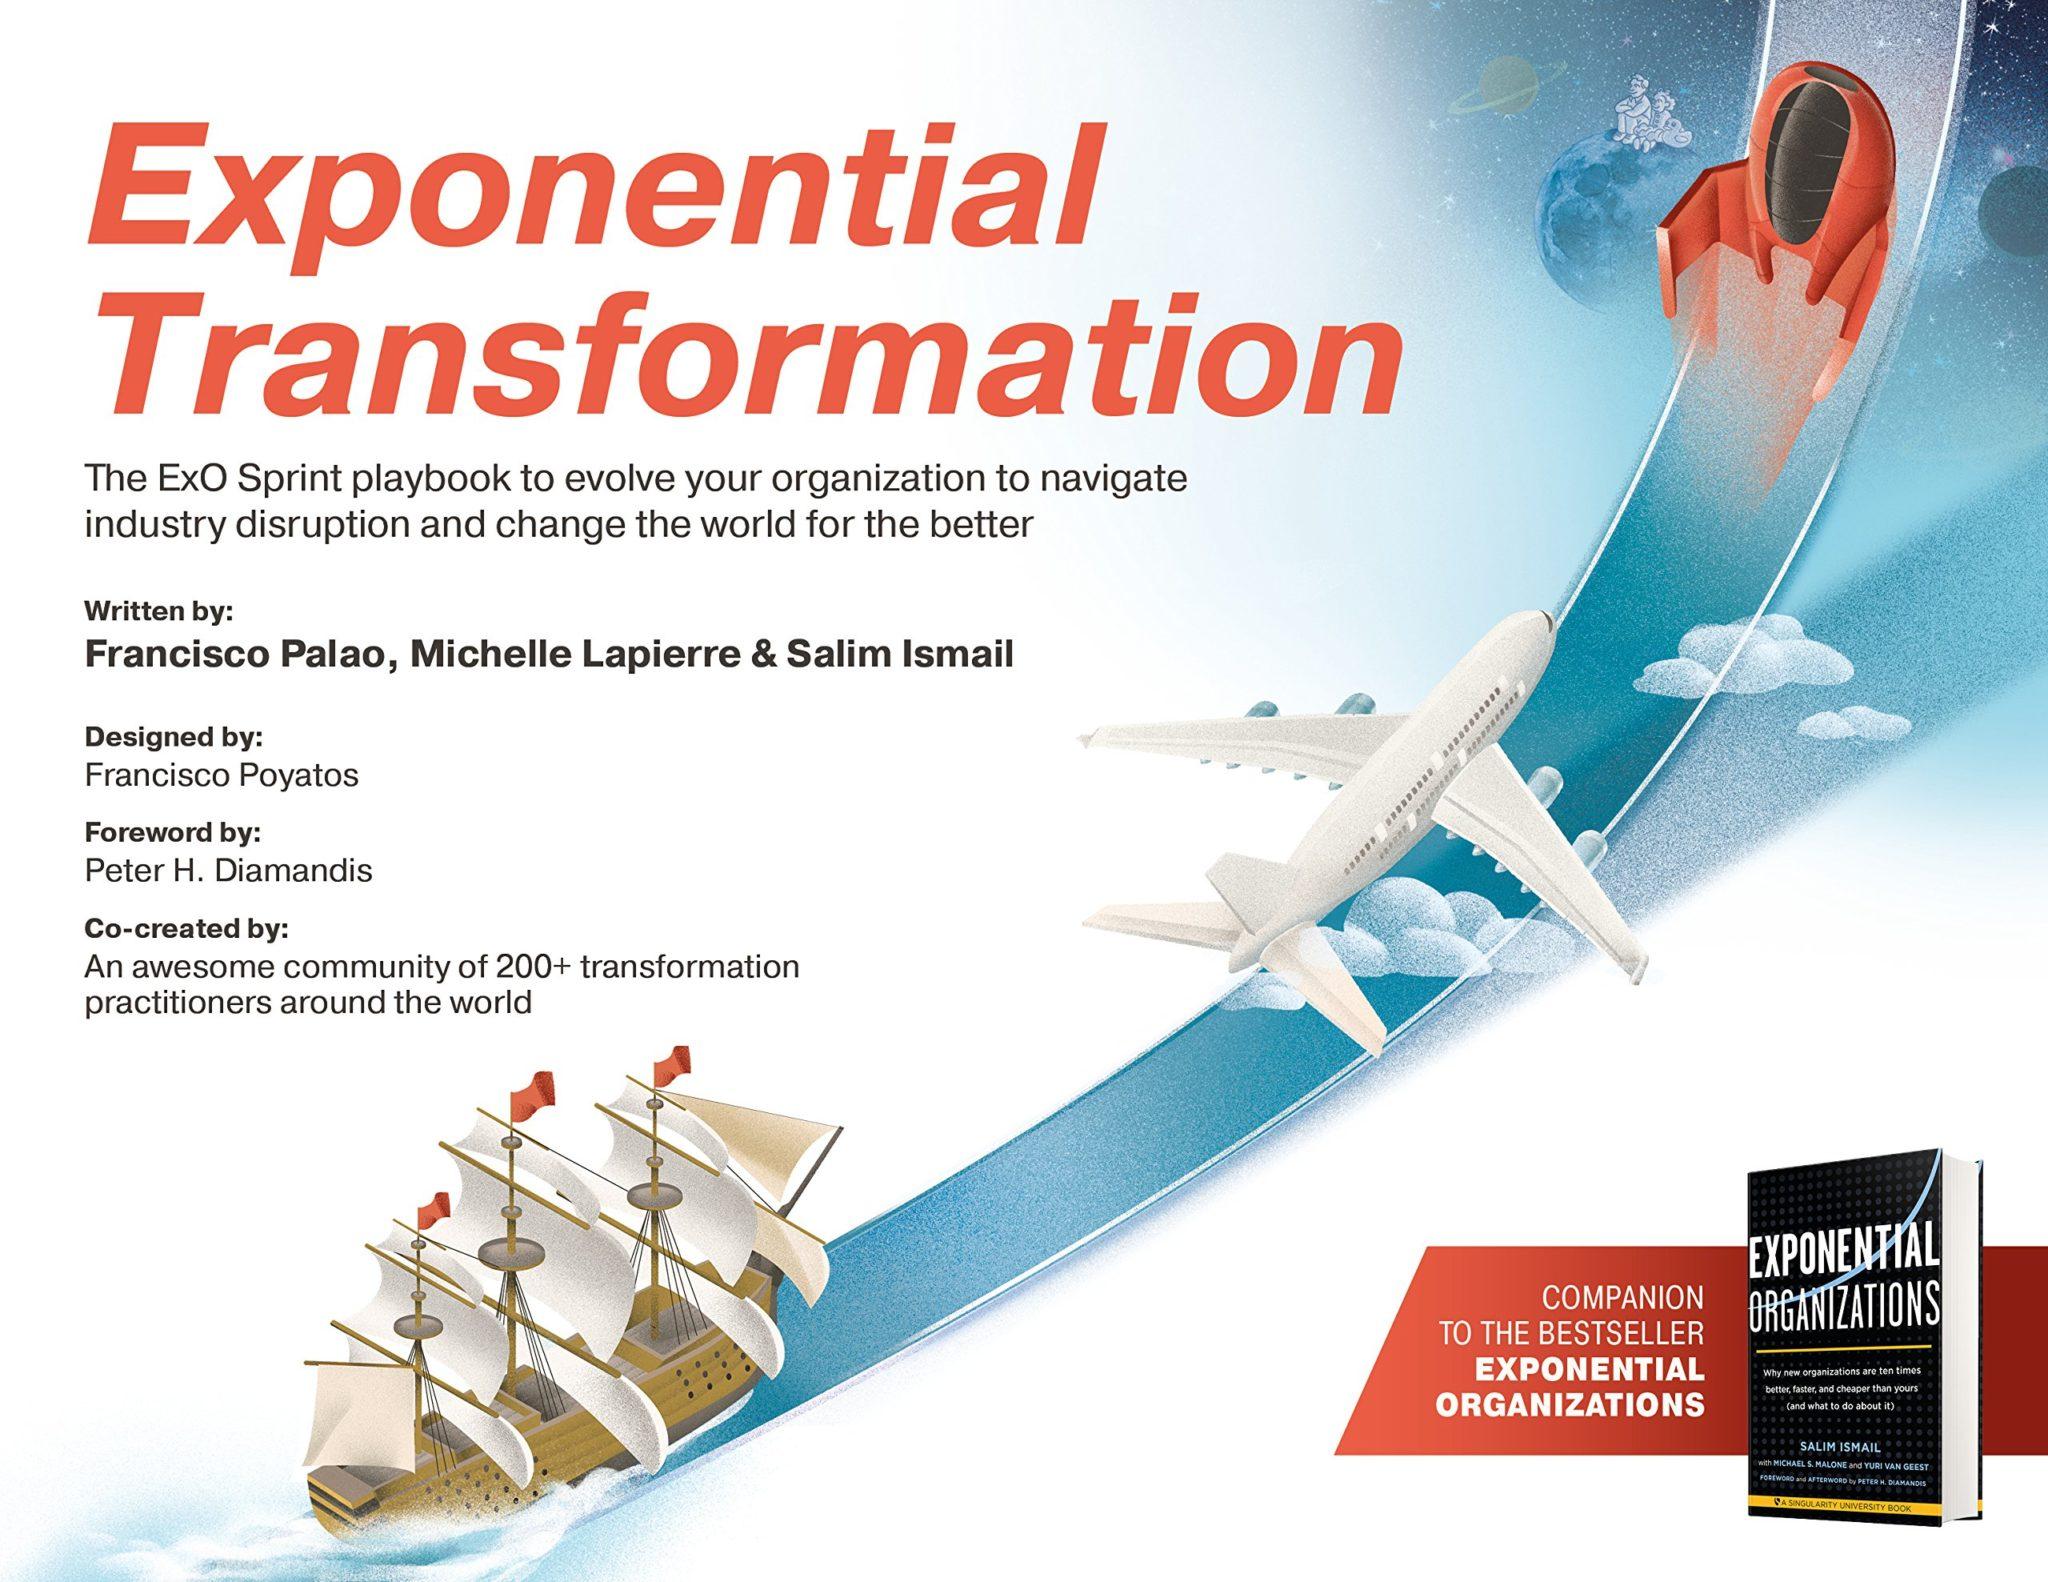 EXPONENTIAL TRANSFORMATION.